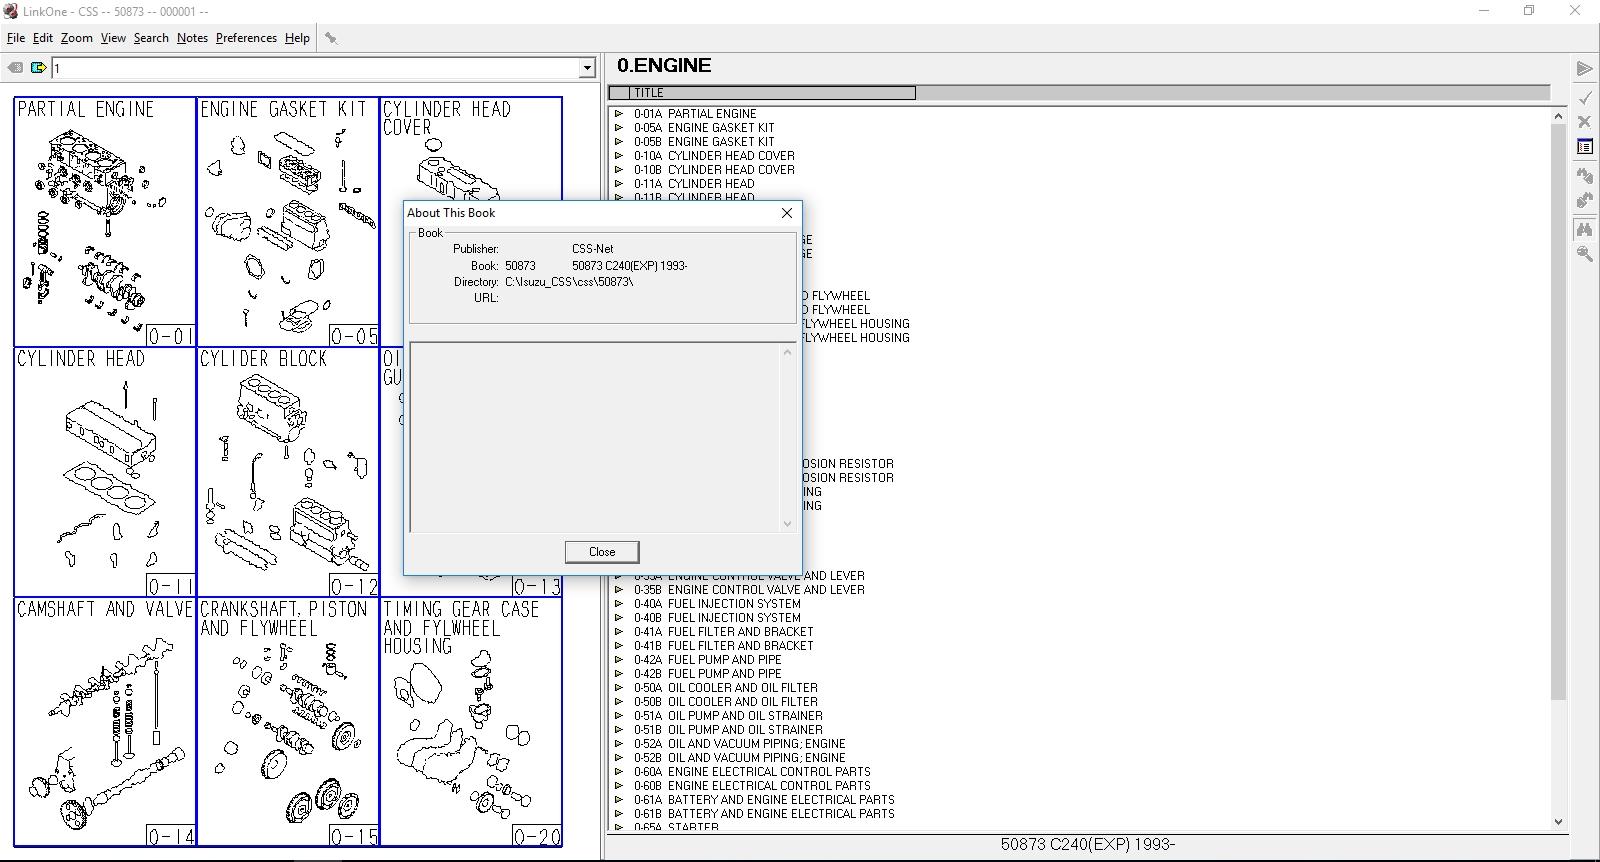 ISUZU_CSS-NET_EPC_052020_Electronic_Parts_Catalog_10